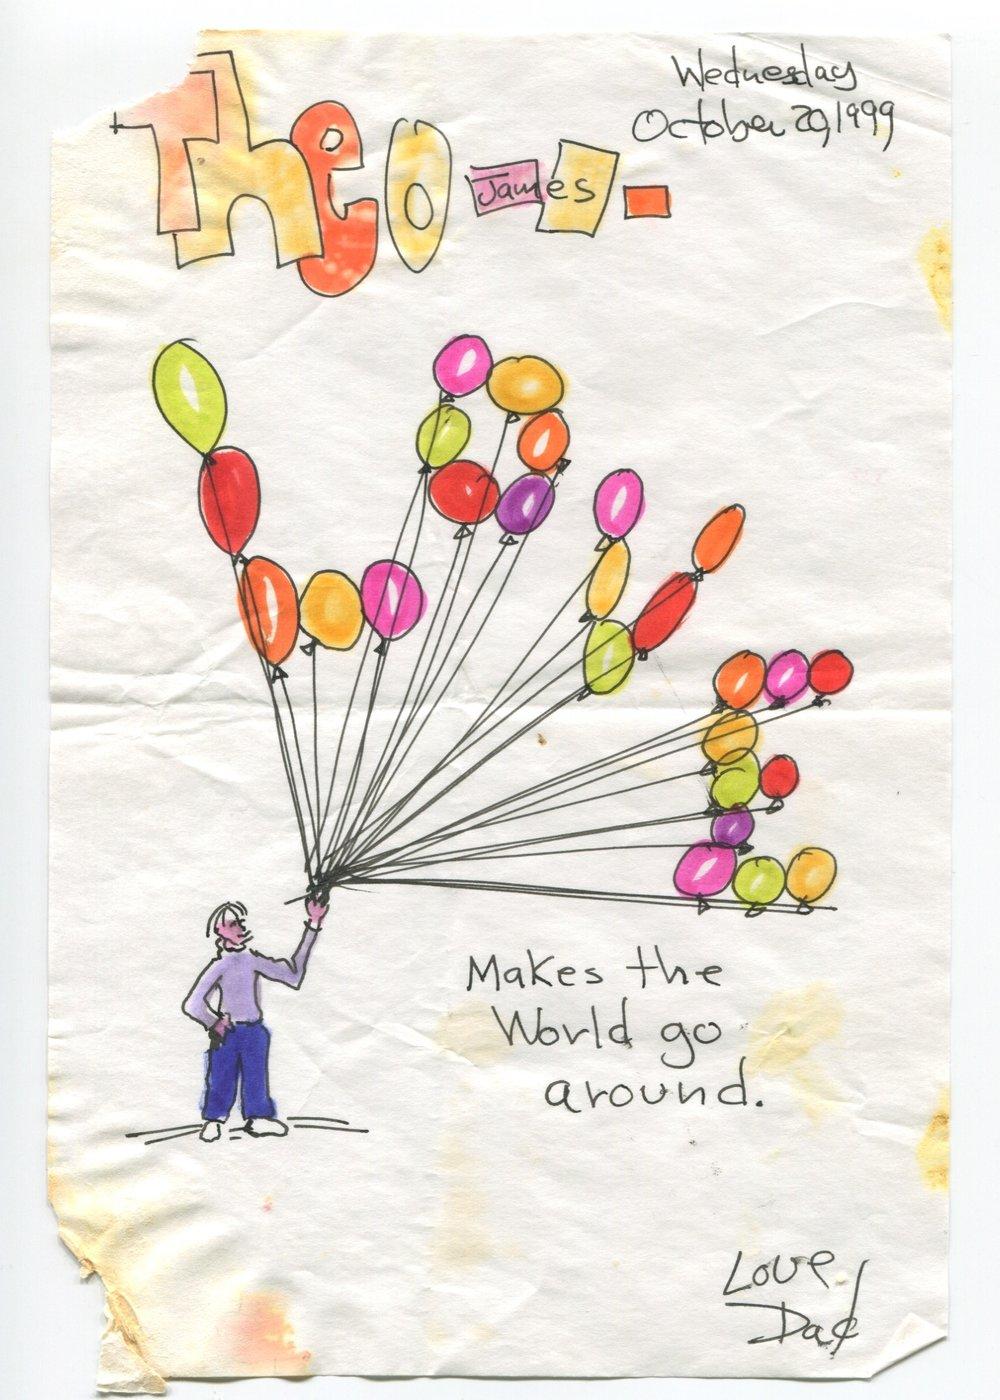 LOVE makes the world go around.